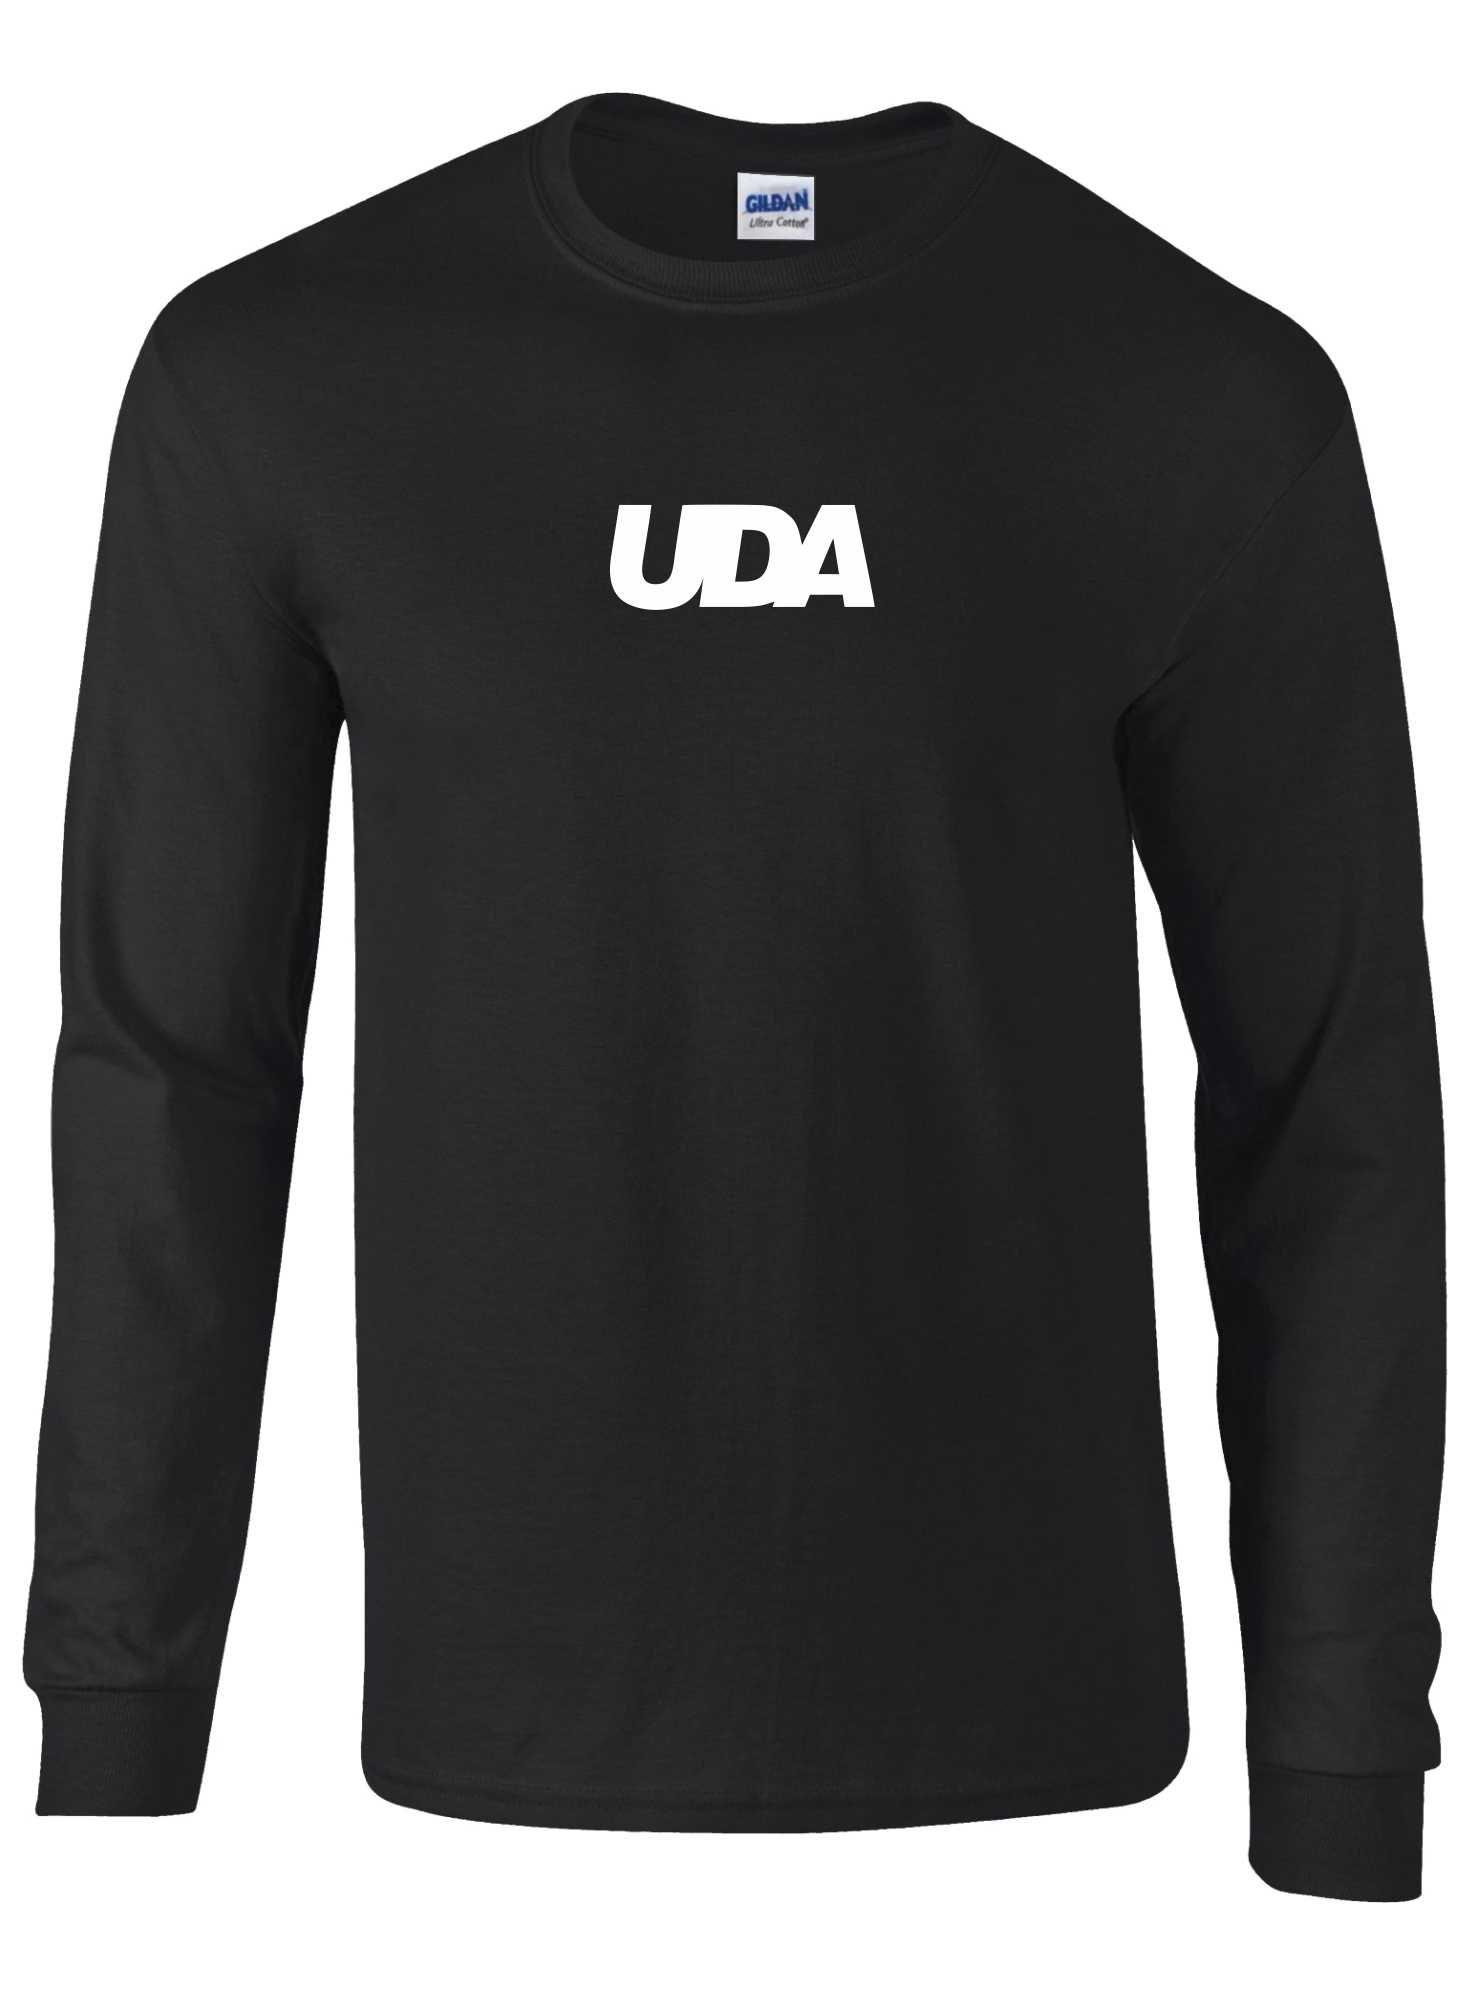 LIMITED EDITION: UDA – Kids T-Shirt L/S (Black & White)